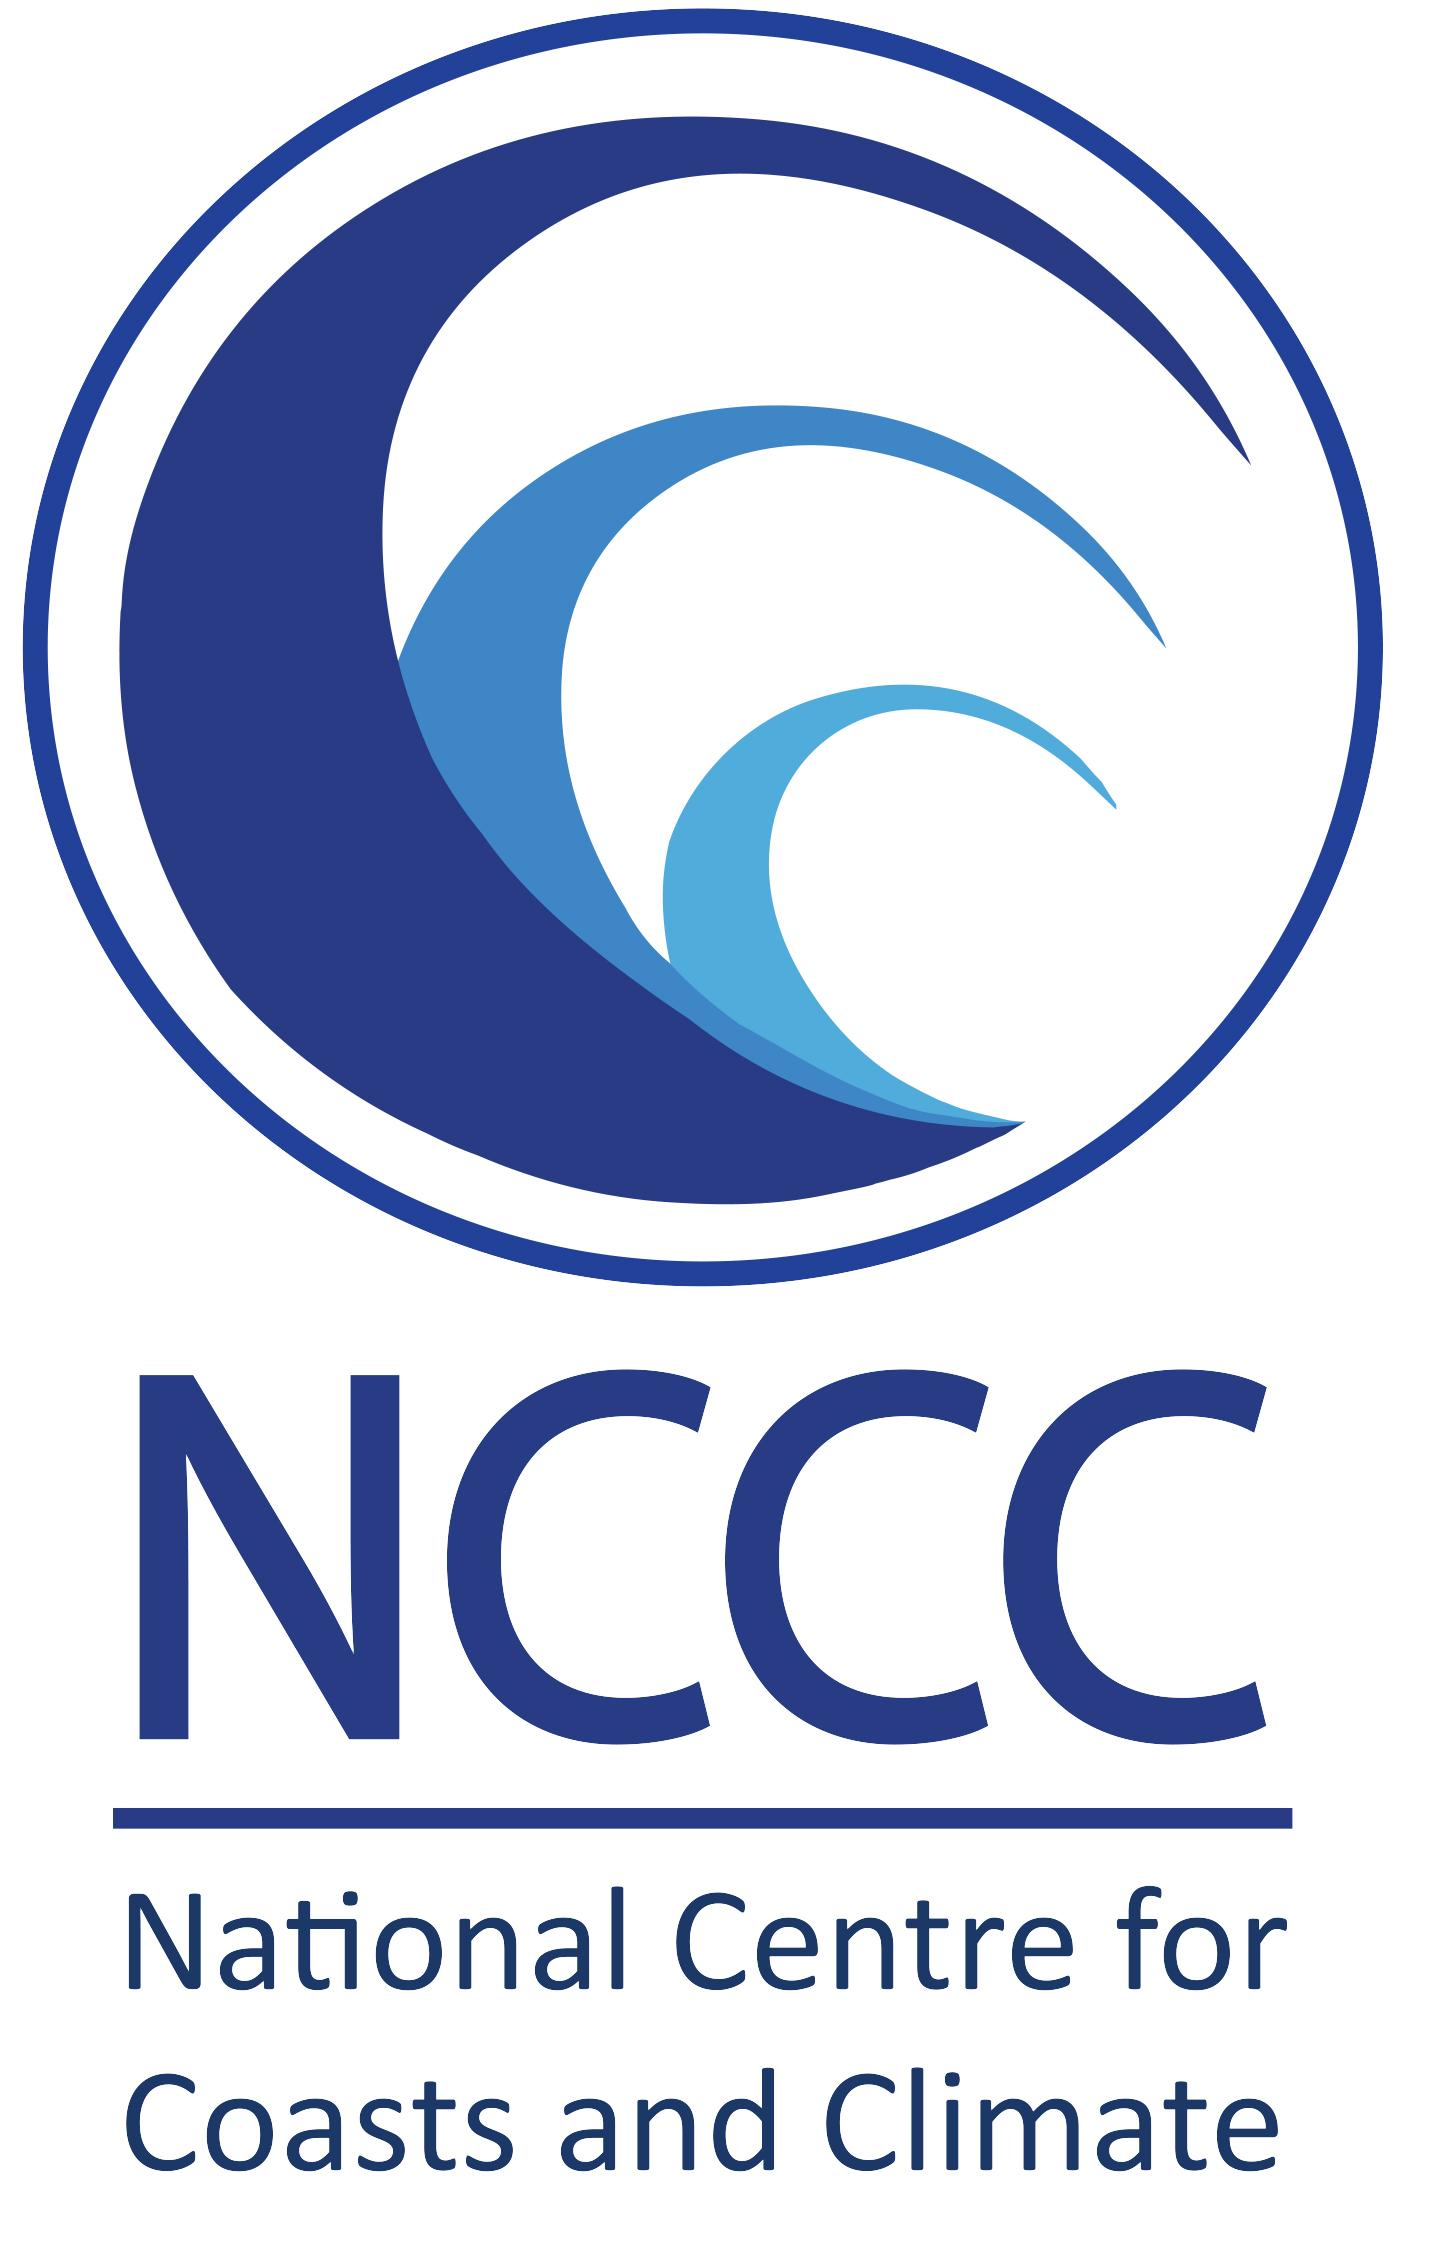 NCCC logo 1.jpg